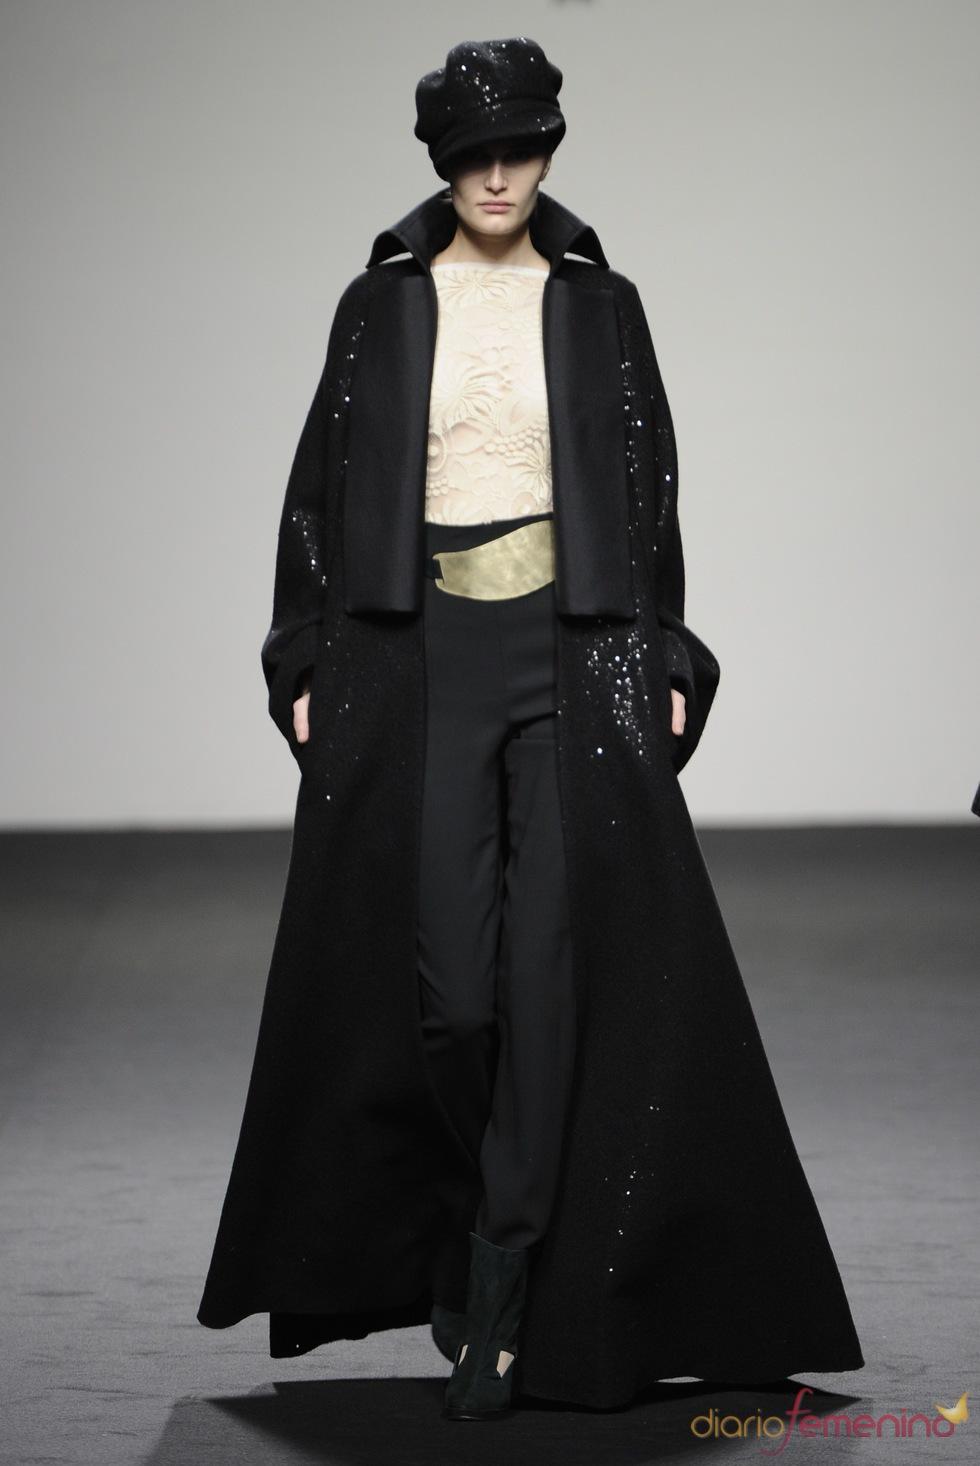 Abrigo años '40. Jesús del Pozo O/I 2011-12. Cibeles Madrid Fashion Week